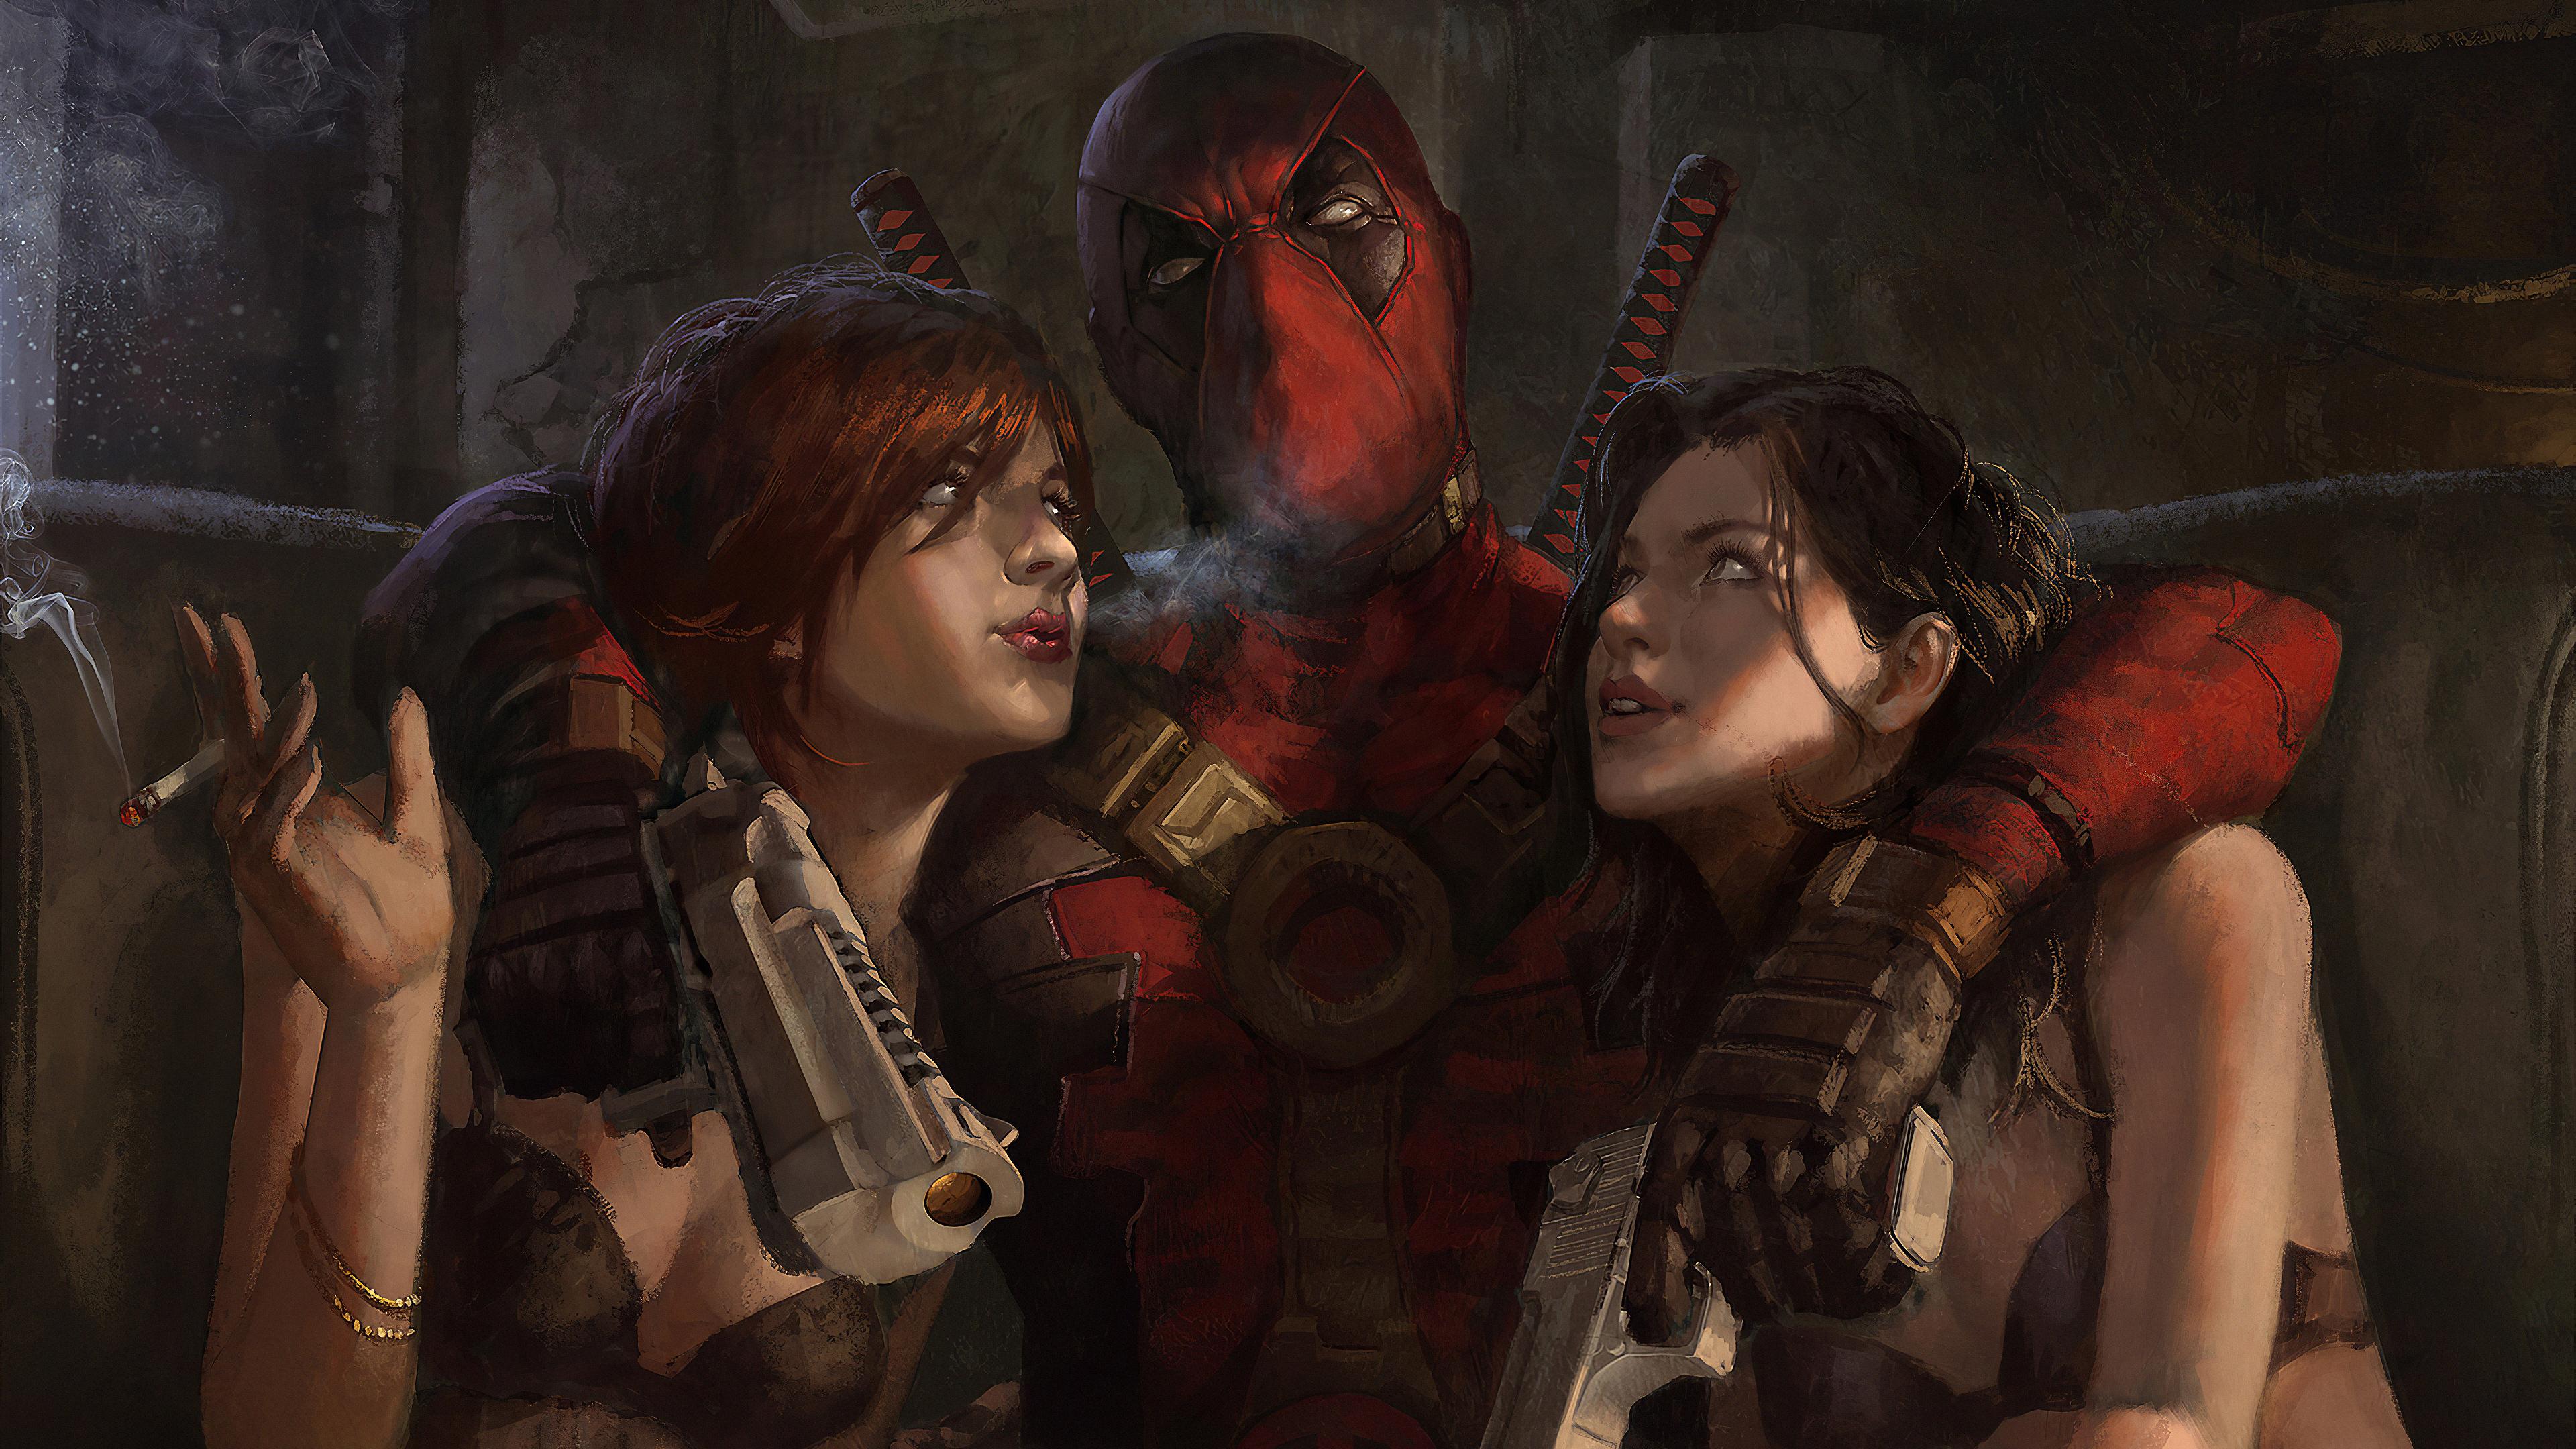 deadpool with girl 1576090701 - Deadpool With Girl - deadpool wallpaper with girl, deadpool wallpaper